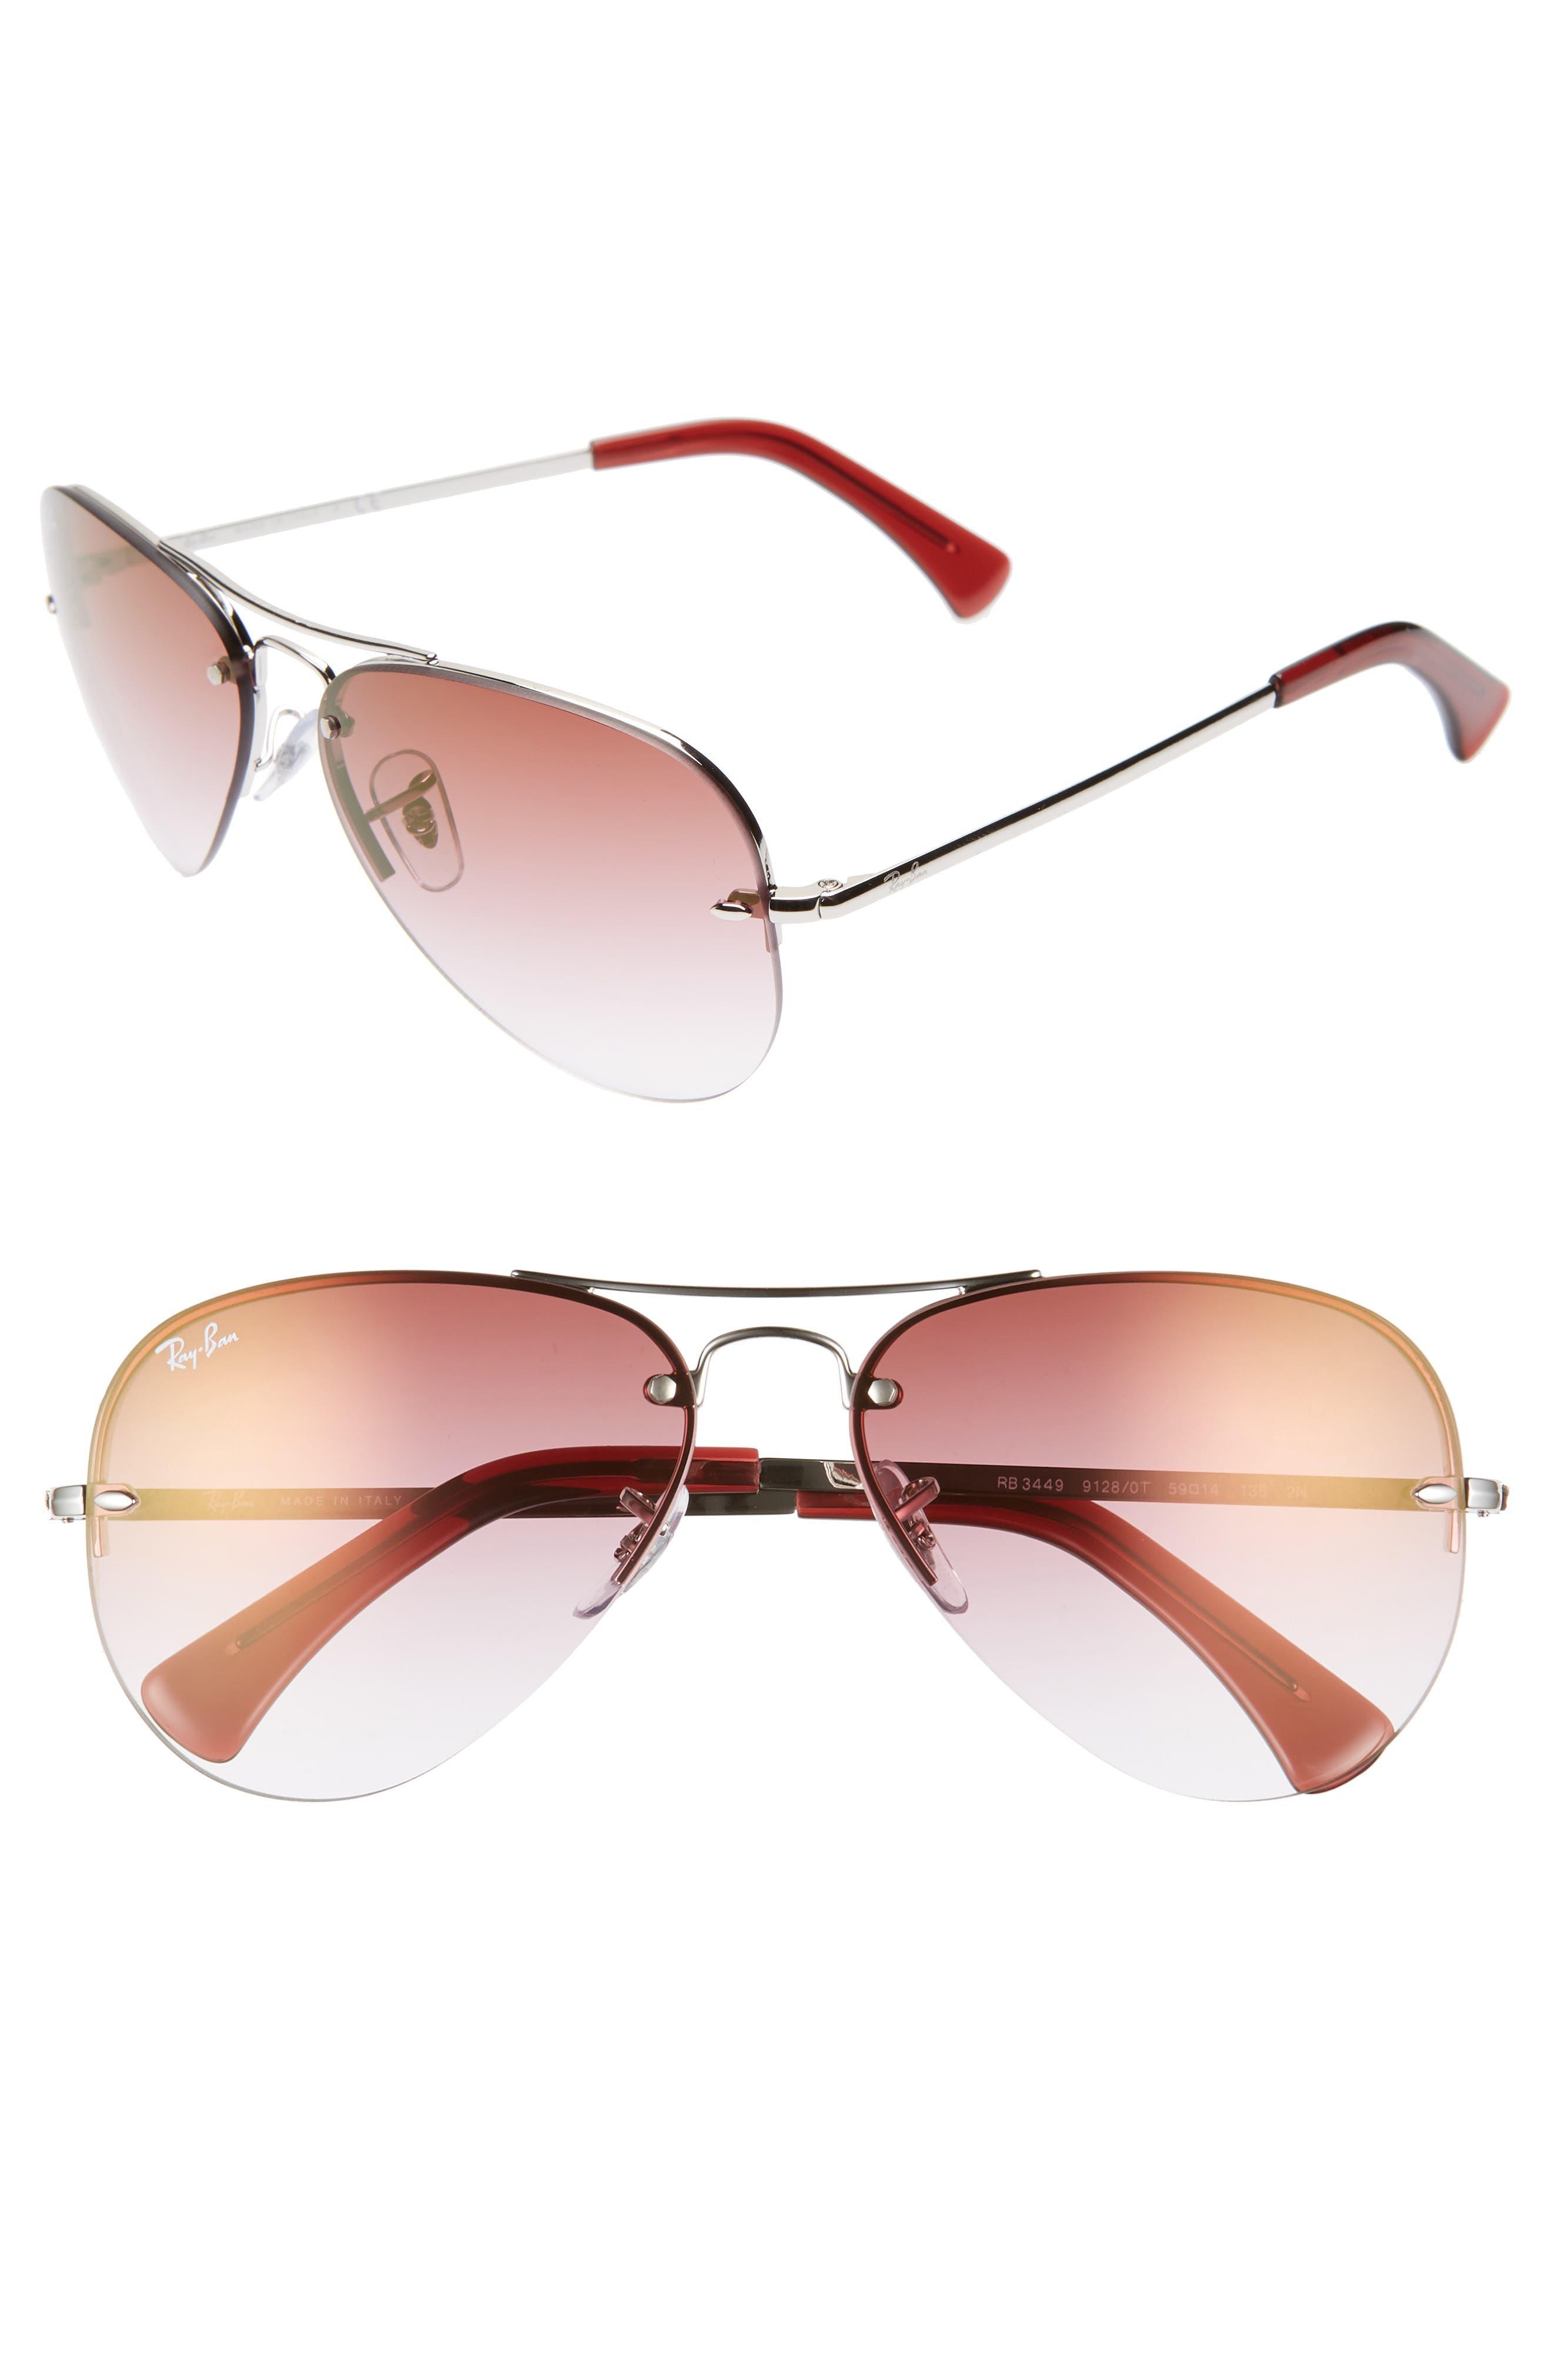 5e9426215f9 Ray-Ban Sunglasses